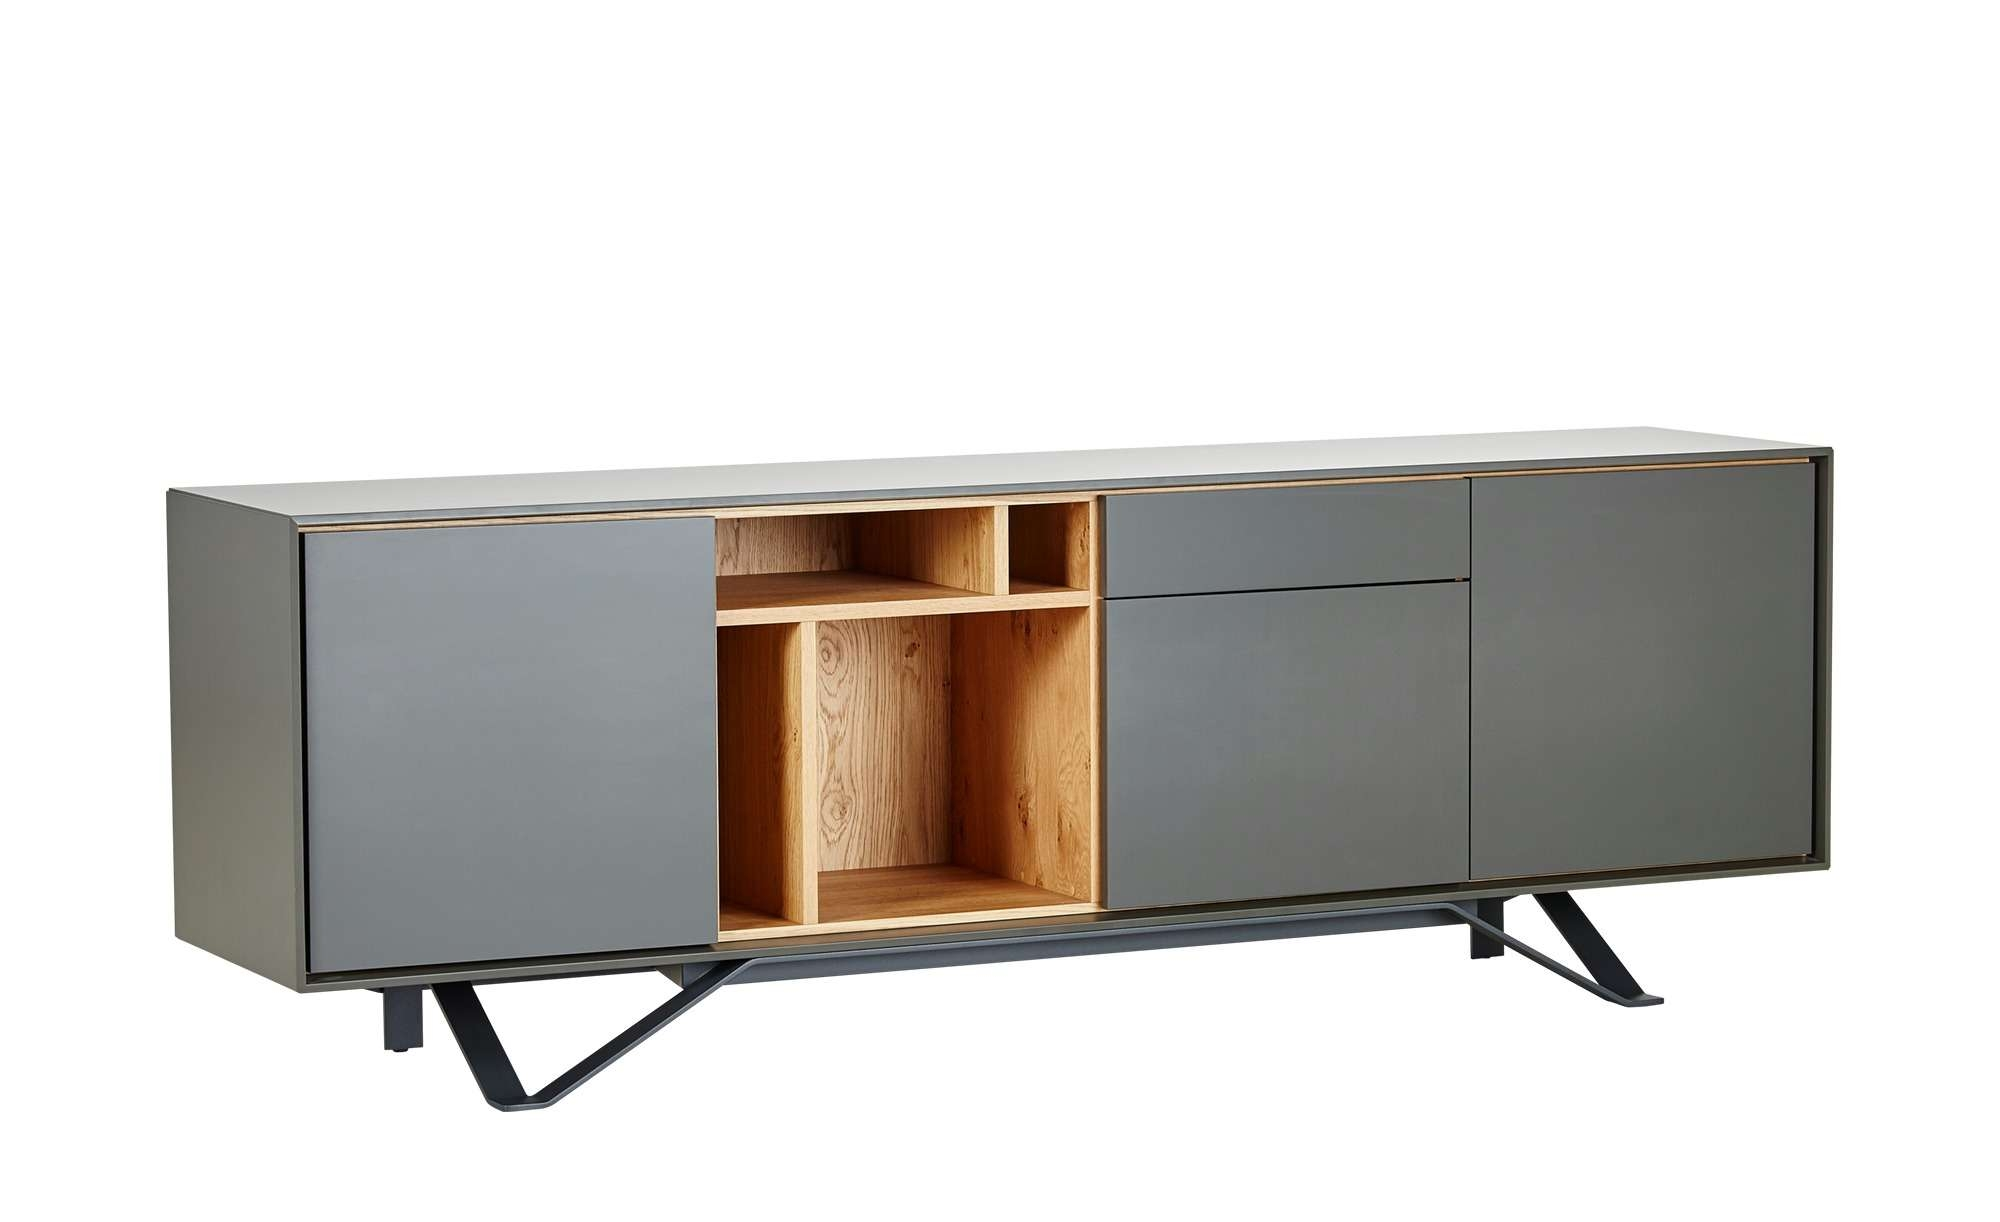 Hülsta Sideboard Scopia | Möbel Höffner Intended For Hulsta Sideboards (View 5 of 20)